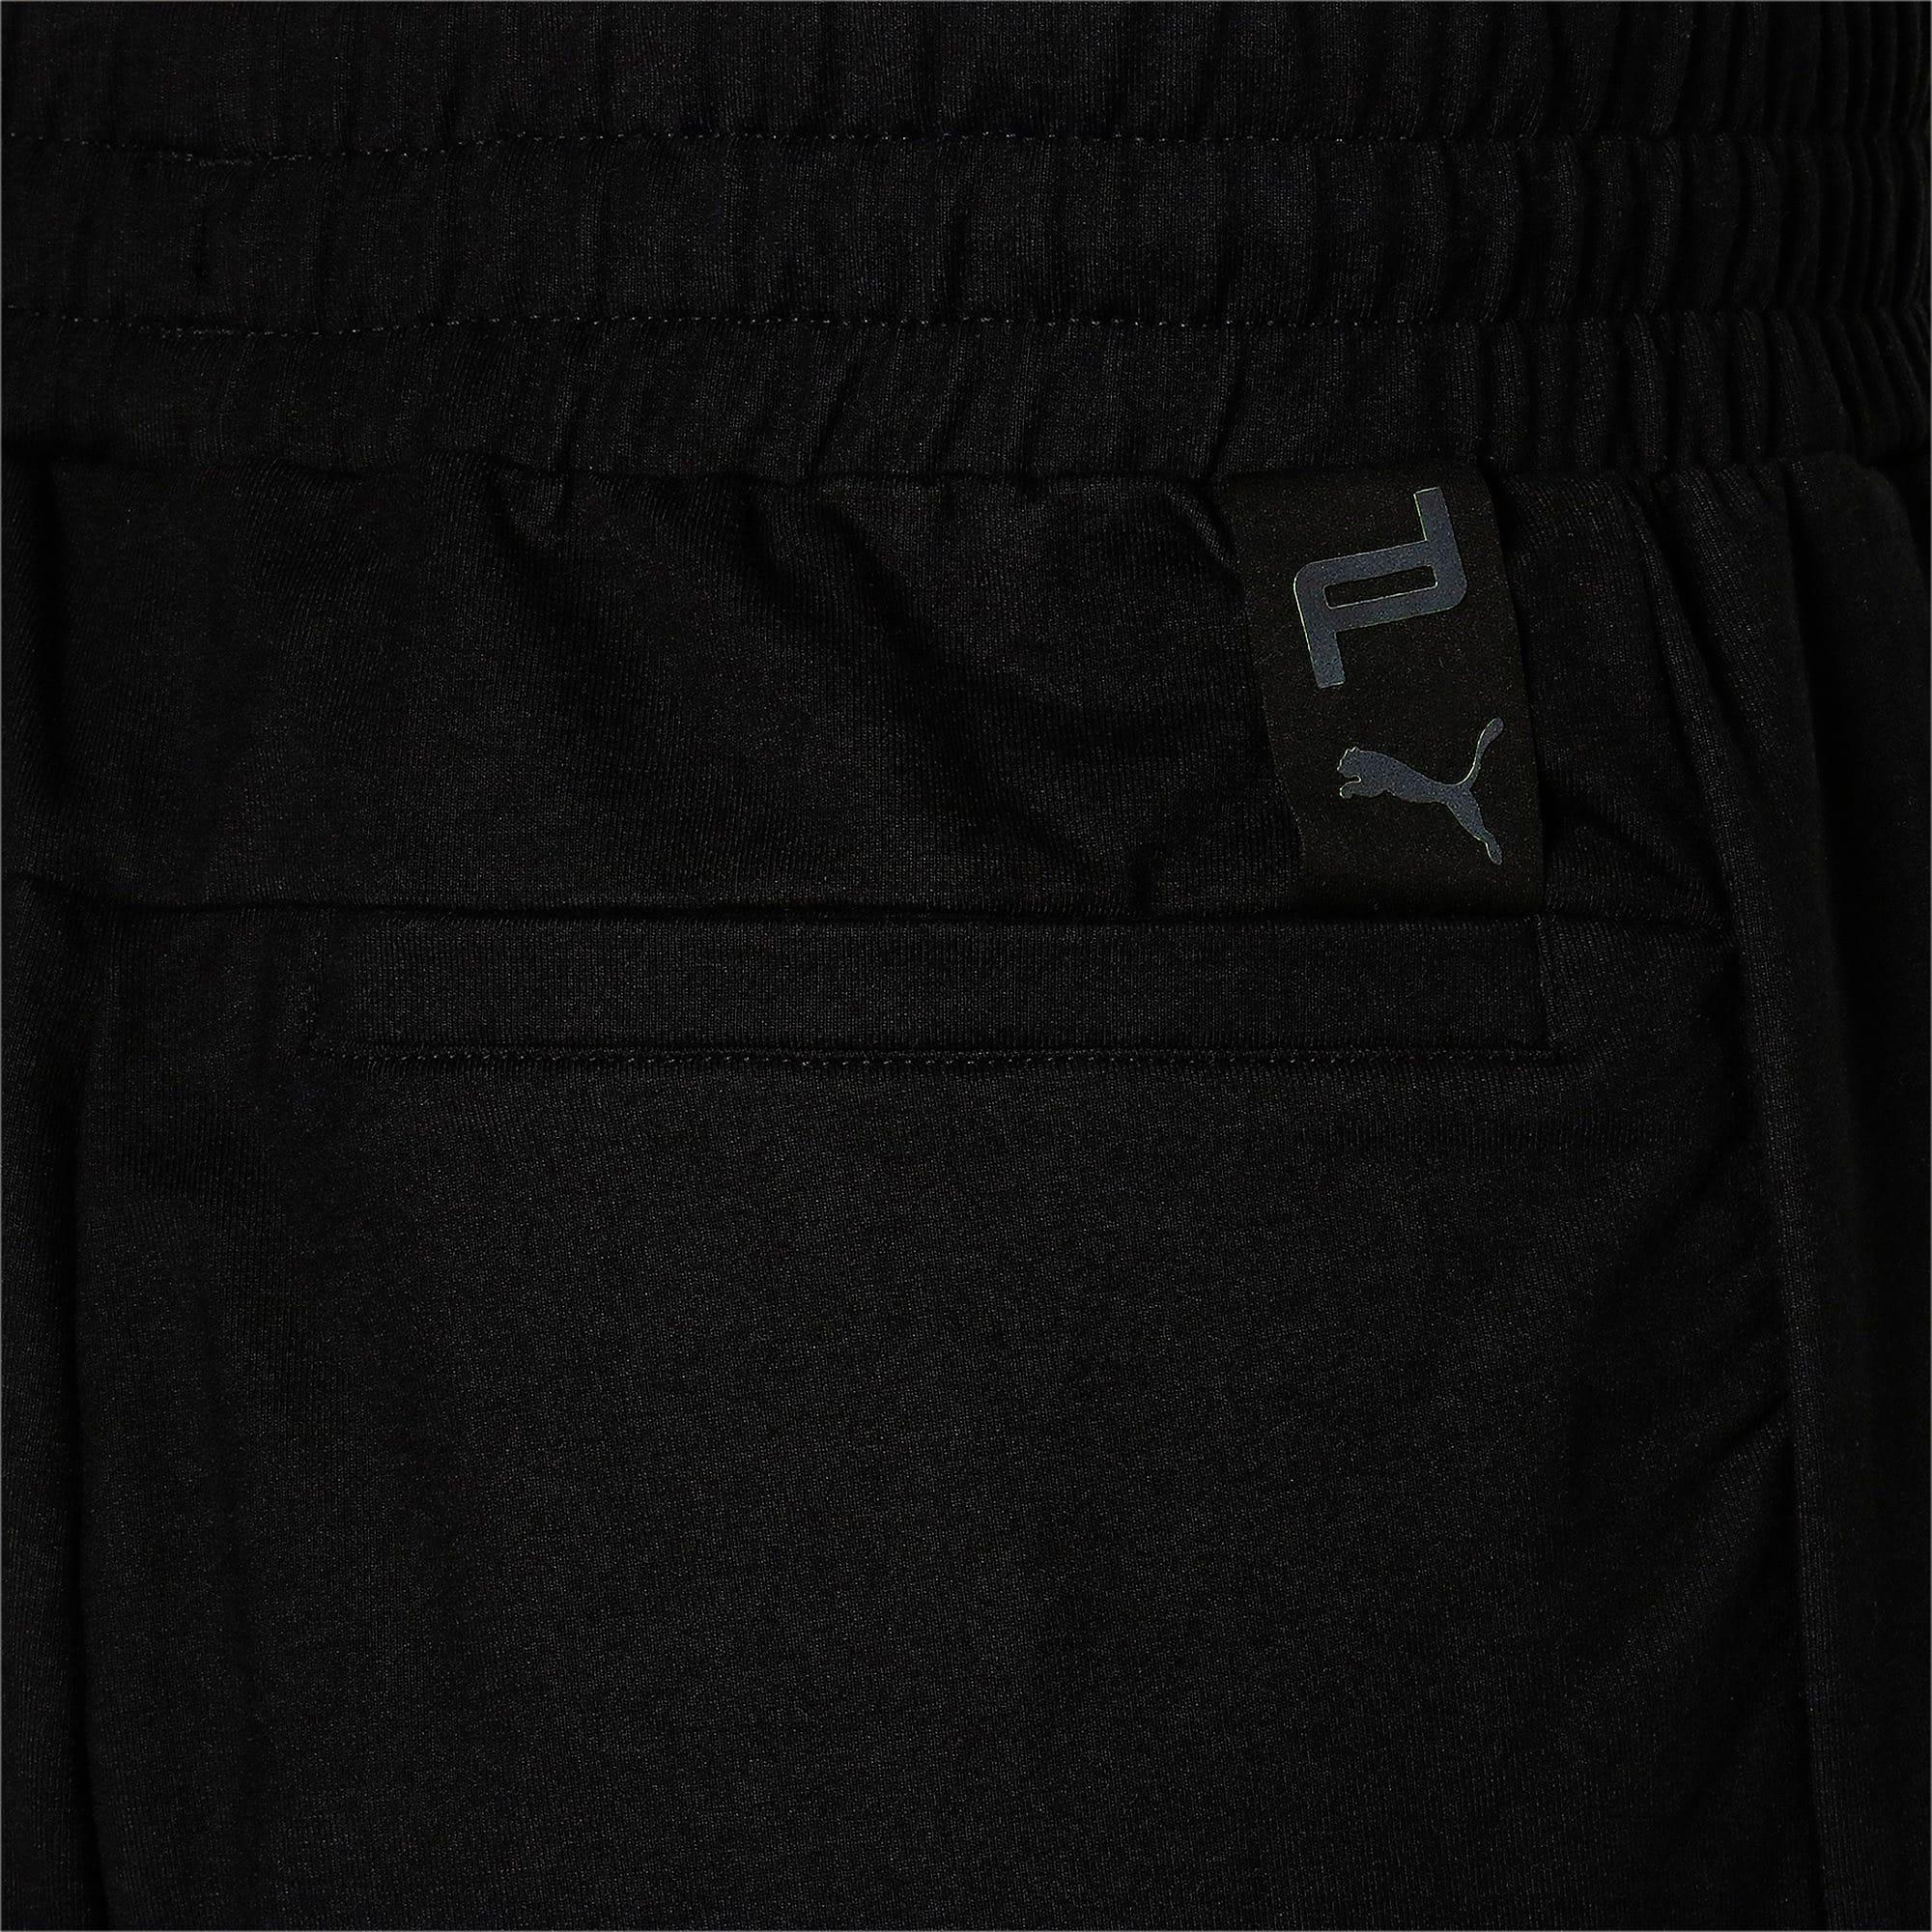 Thumbnail 11 of M ポルシェデザイン PD T7 スウェット パンツ, Jet Black, medium-JPN